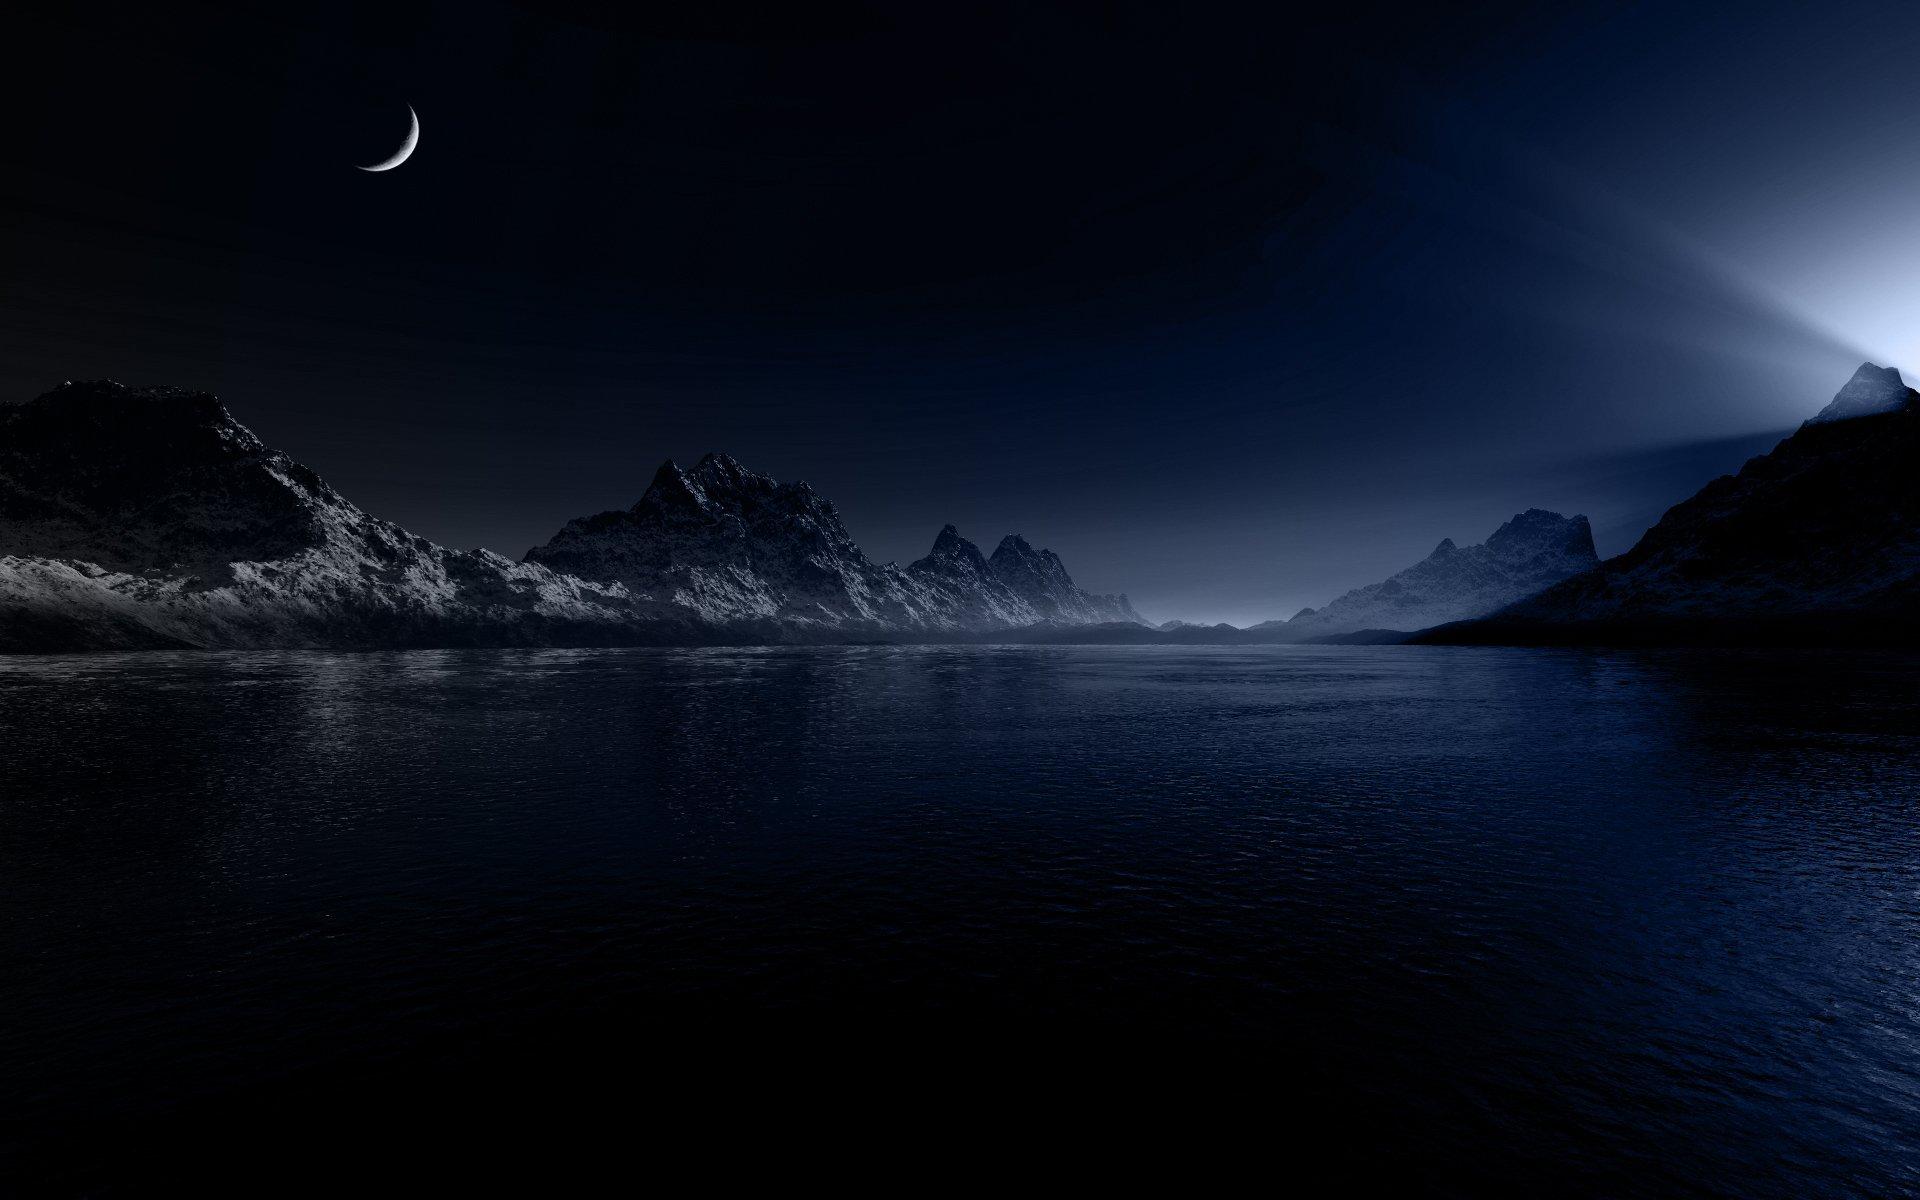 Hd wallpaper night - Landscapes Night Wallpaper 1920x1200 Landscapes Night Moon